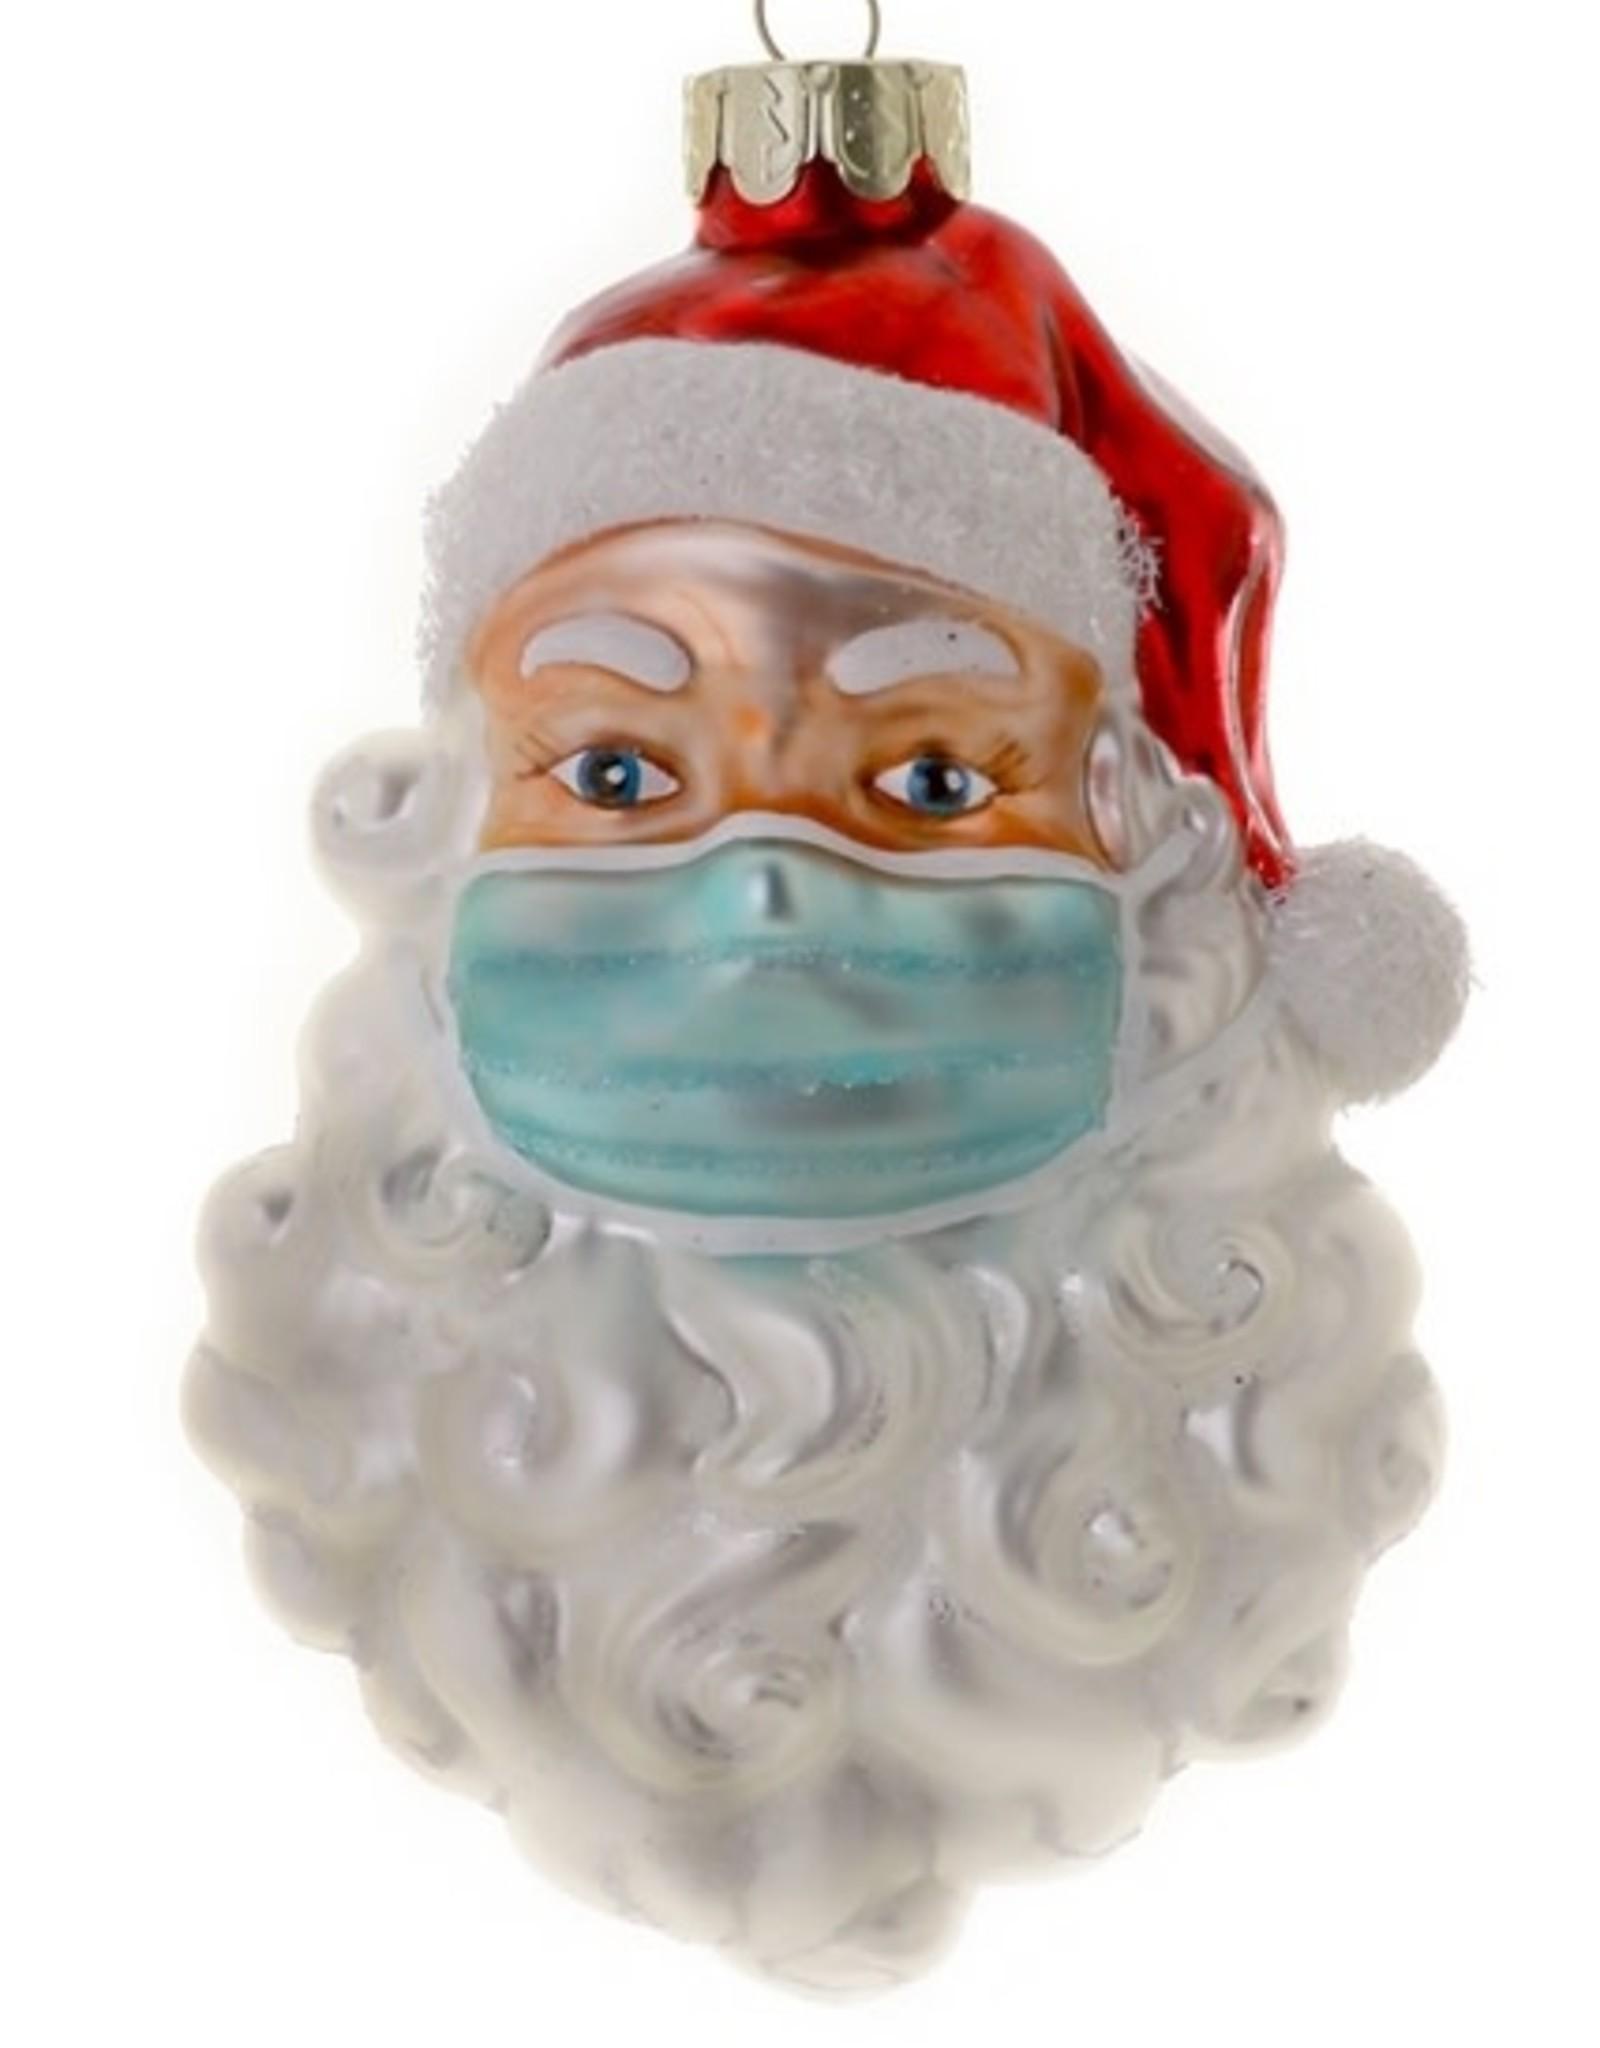 Santa with Mask 2020 Ornament